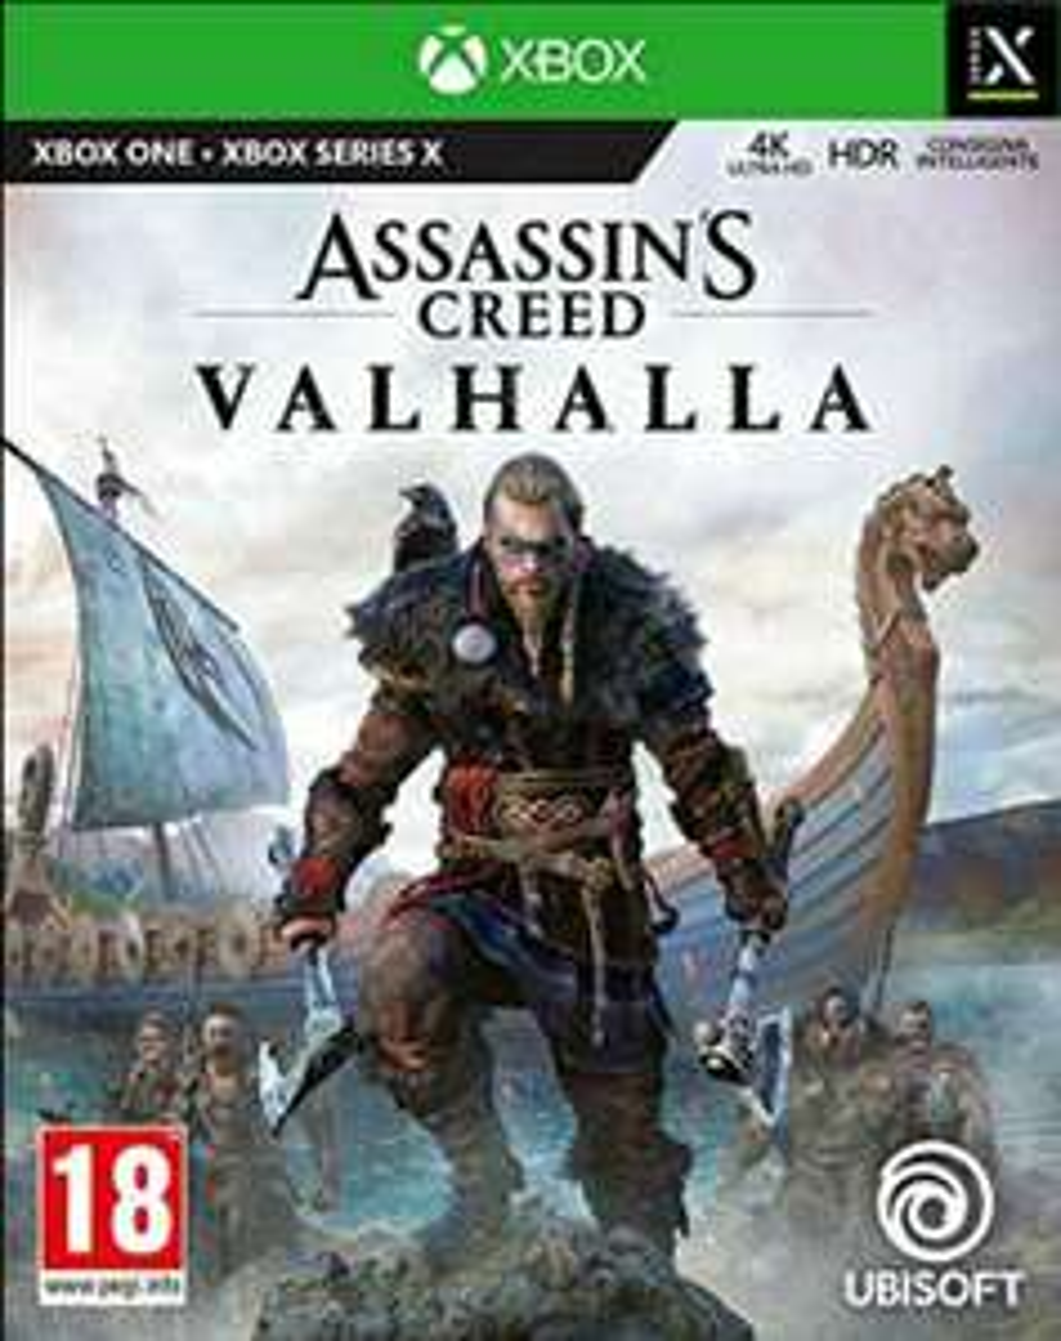 Assassins Creed Valhalla Xbox - Xbox One/Series X